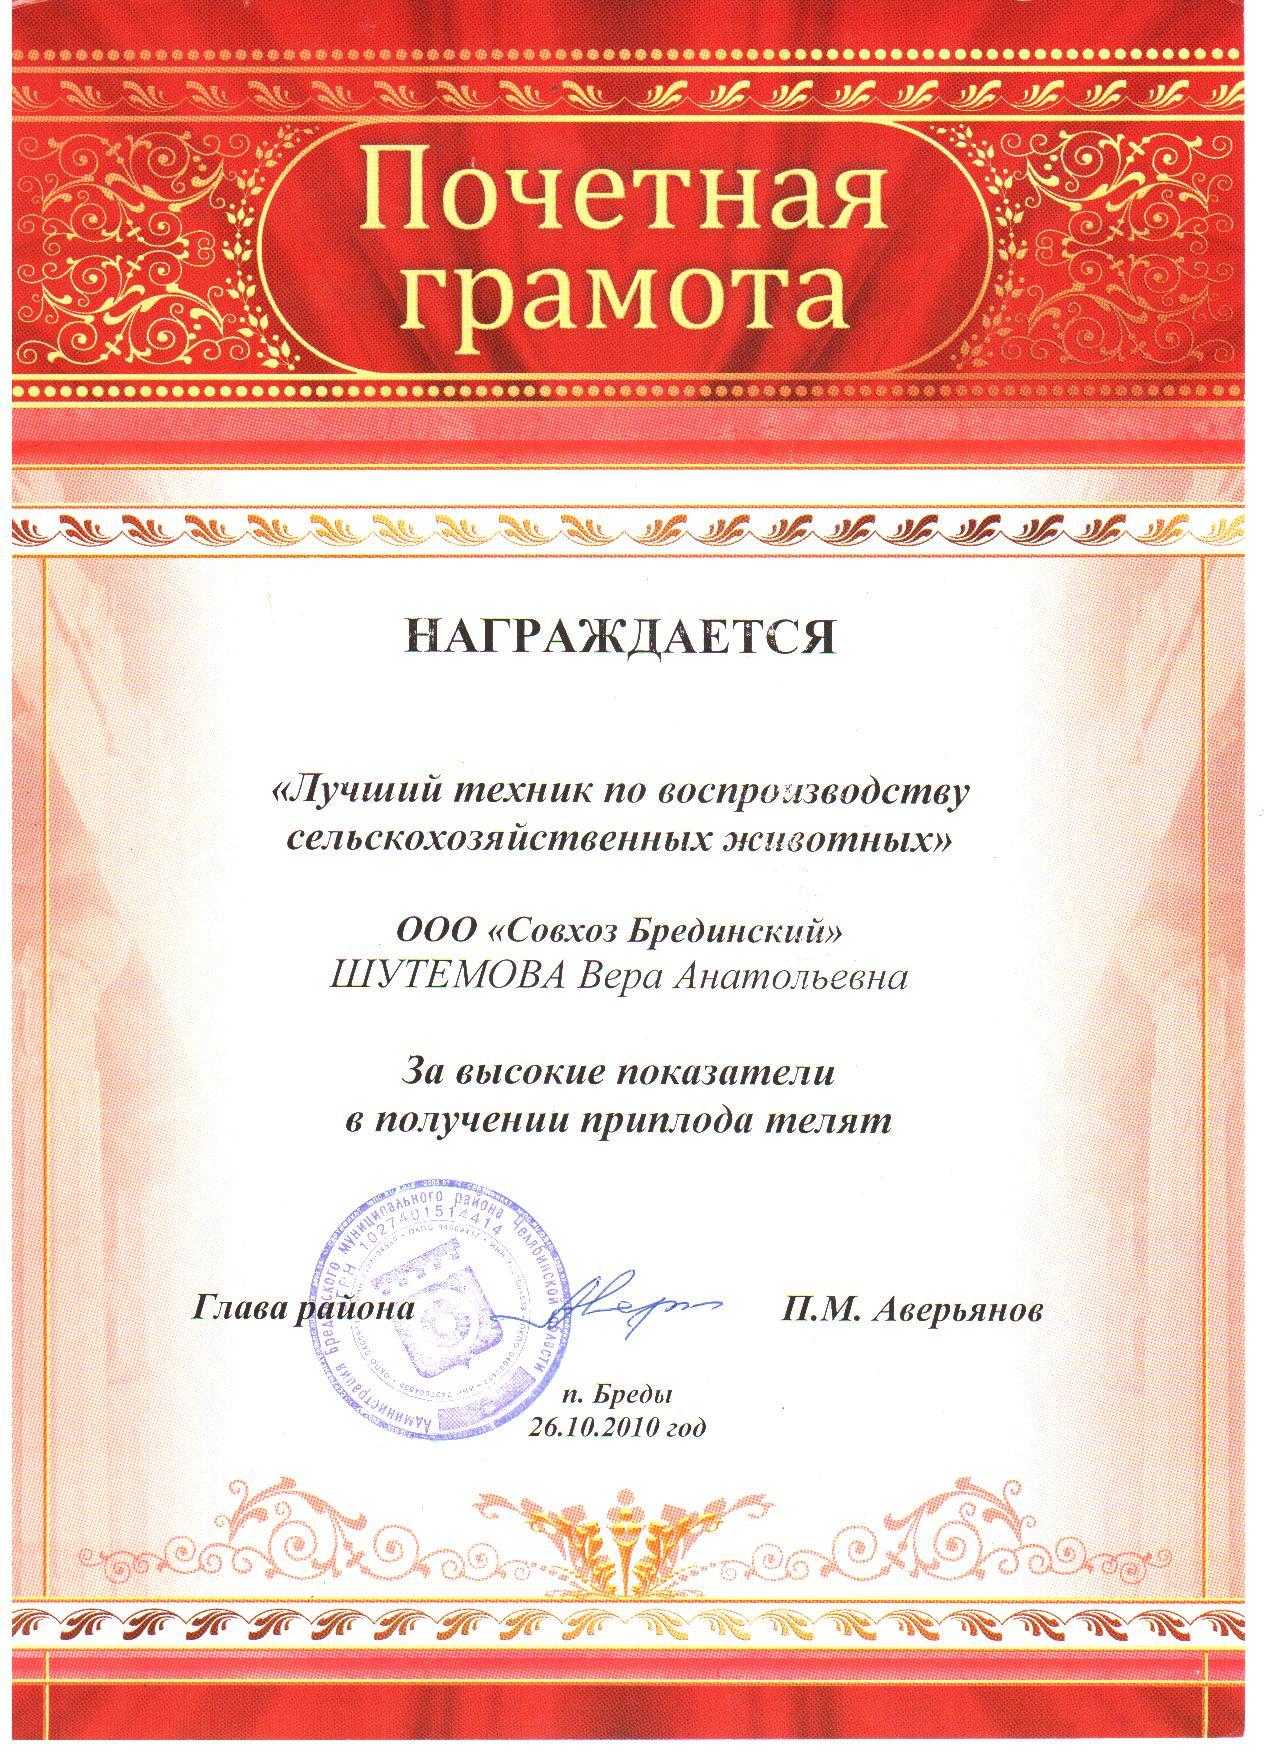 C:\Documents and Settings\Администратор\Рабочий стол\Шутёмова приложение\Изображение 015.jpg